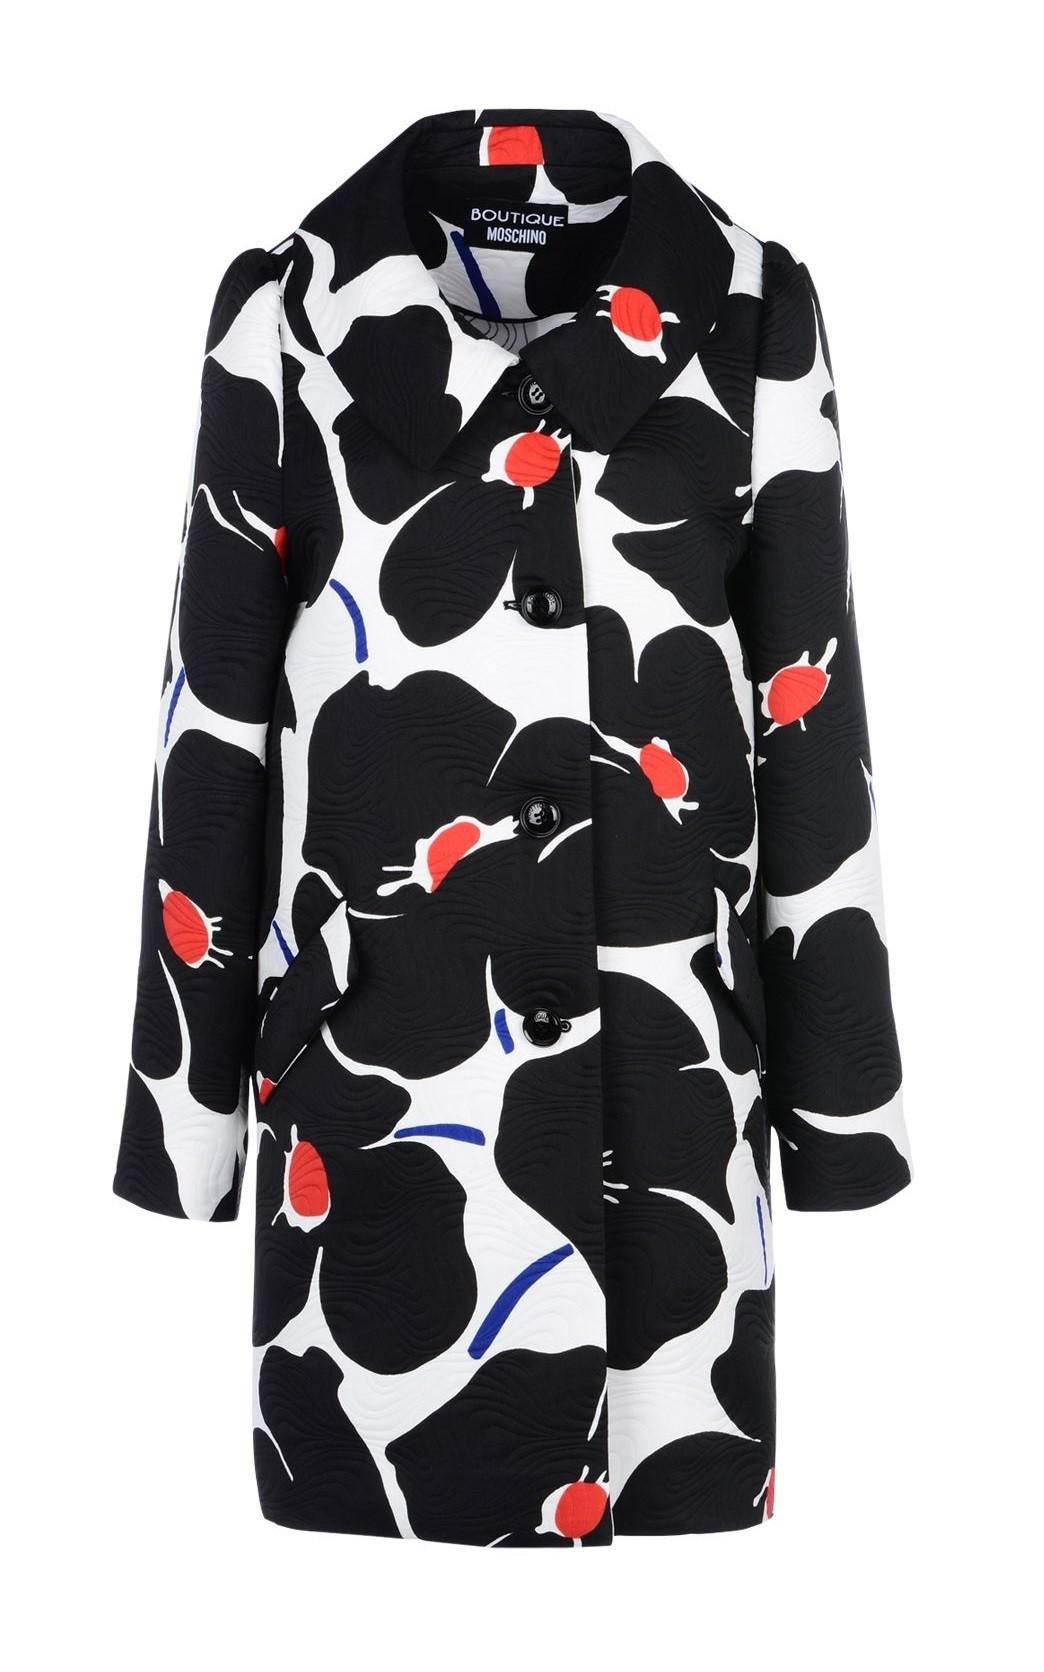 Boutique moschino płaszcz ha0601